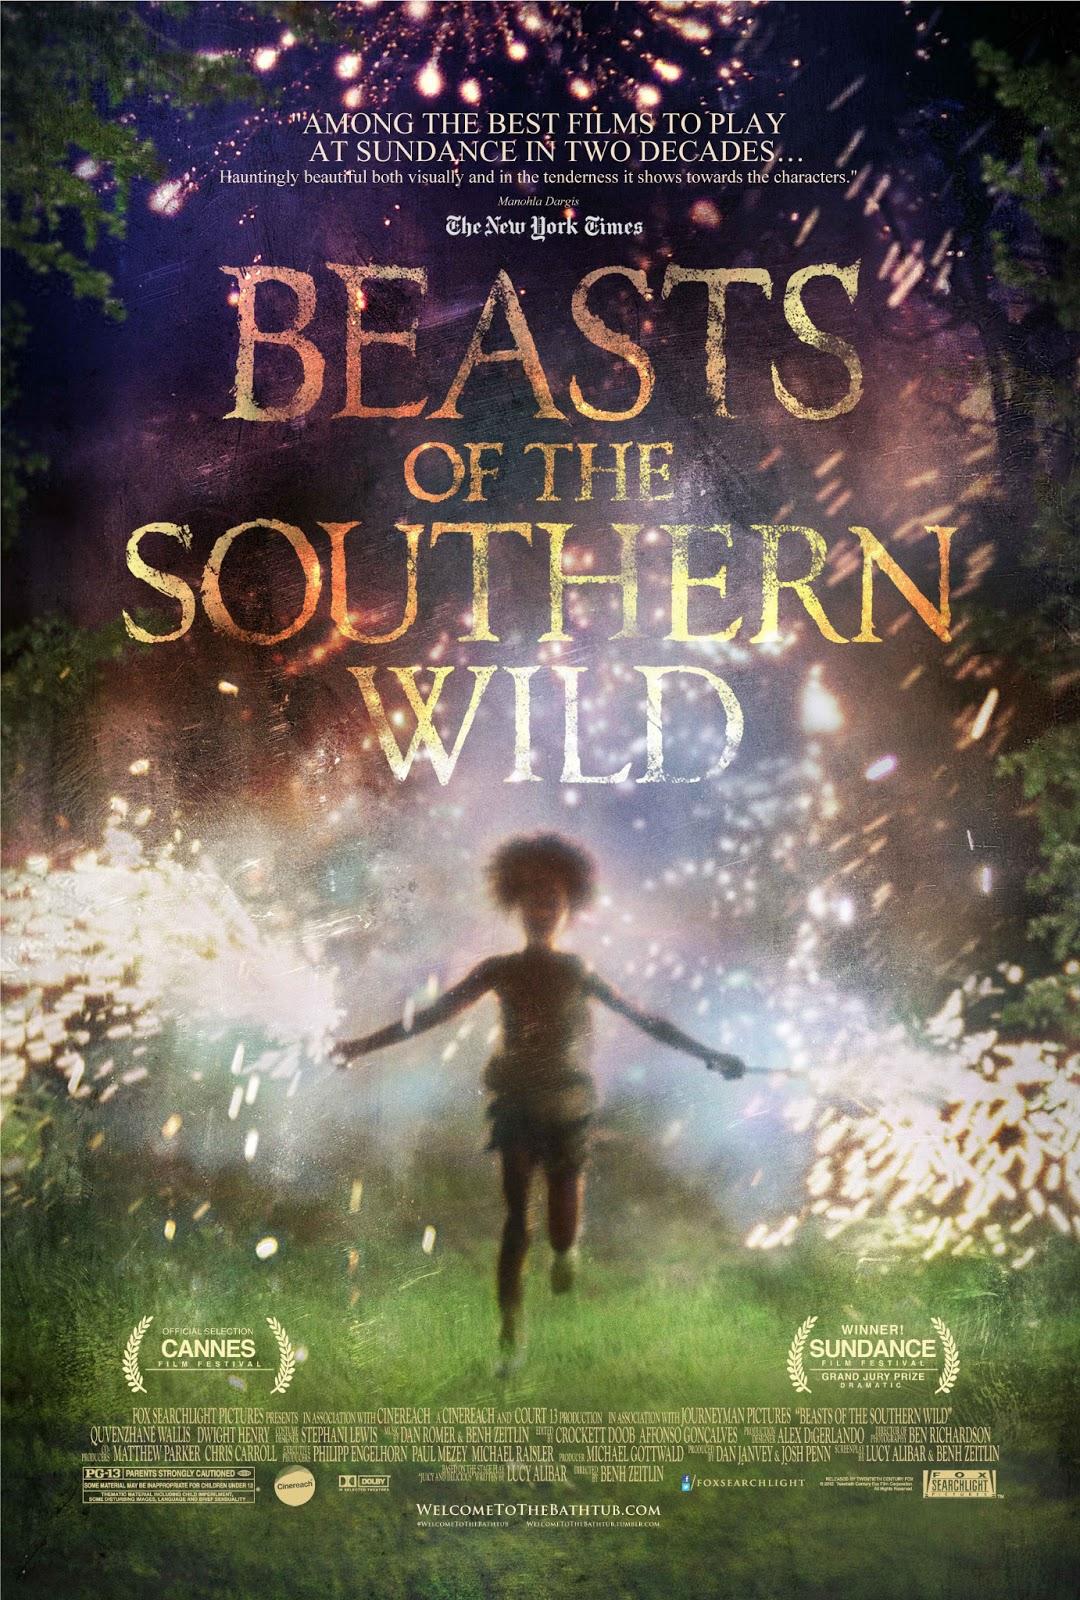 http://3.bp.blogspot.com/-_DjWKJI8iIc/UQWfC87czVI/AAAAAAAAH18/ys8P21SftXw/s1600/beasts+of+the+southern+wild.jpg